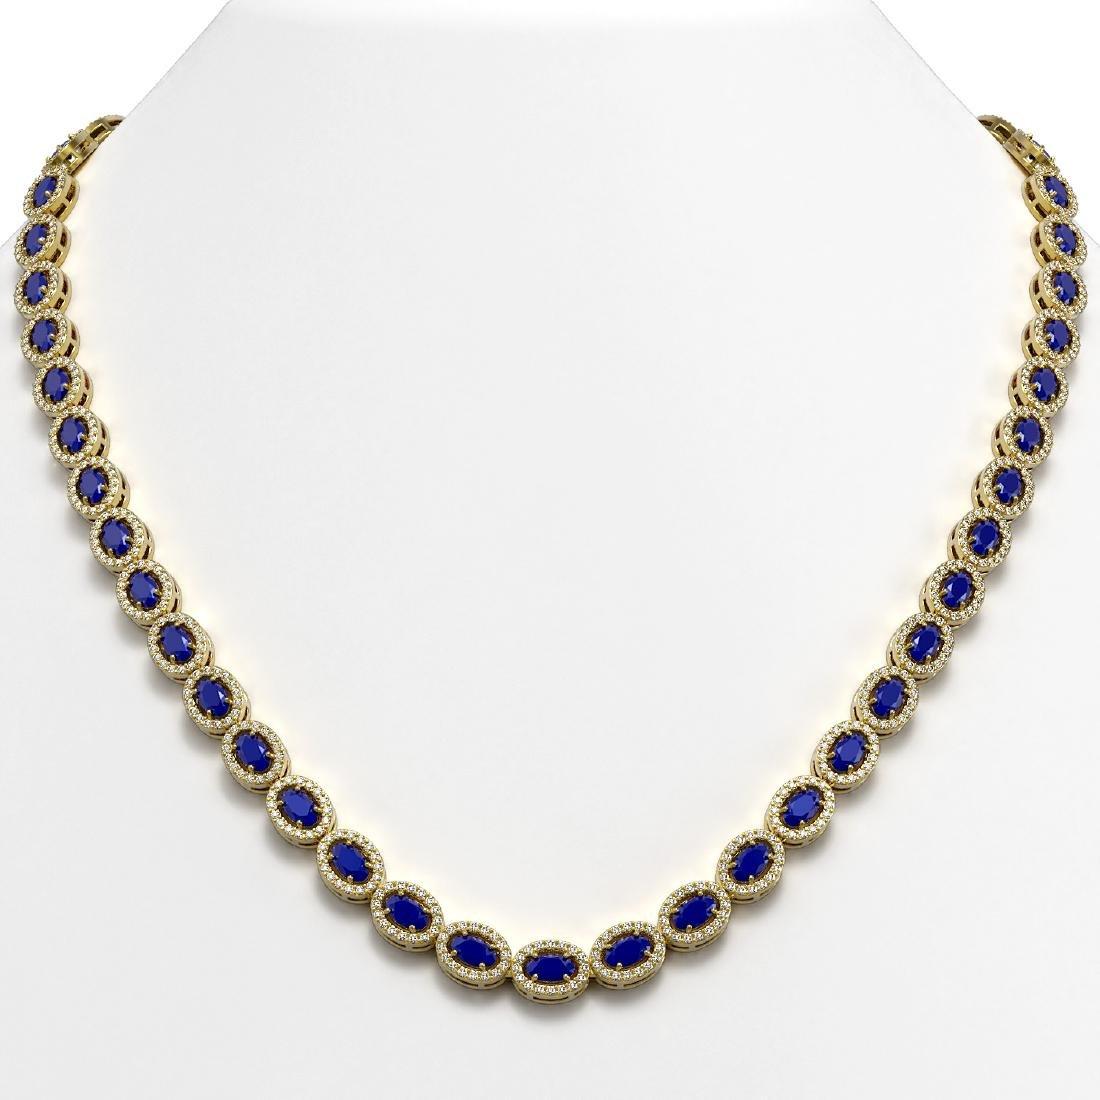 26.38 CTW Sapphire & Diamond Halo Necklace 10K Yellow